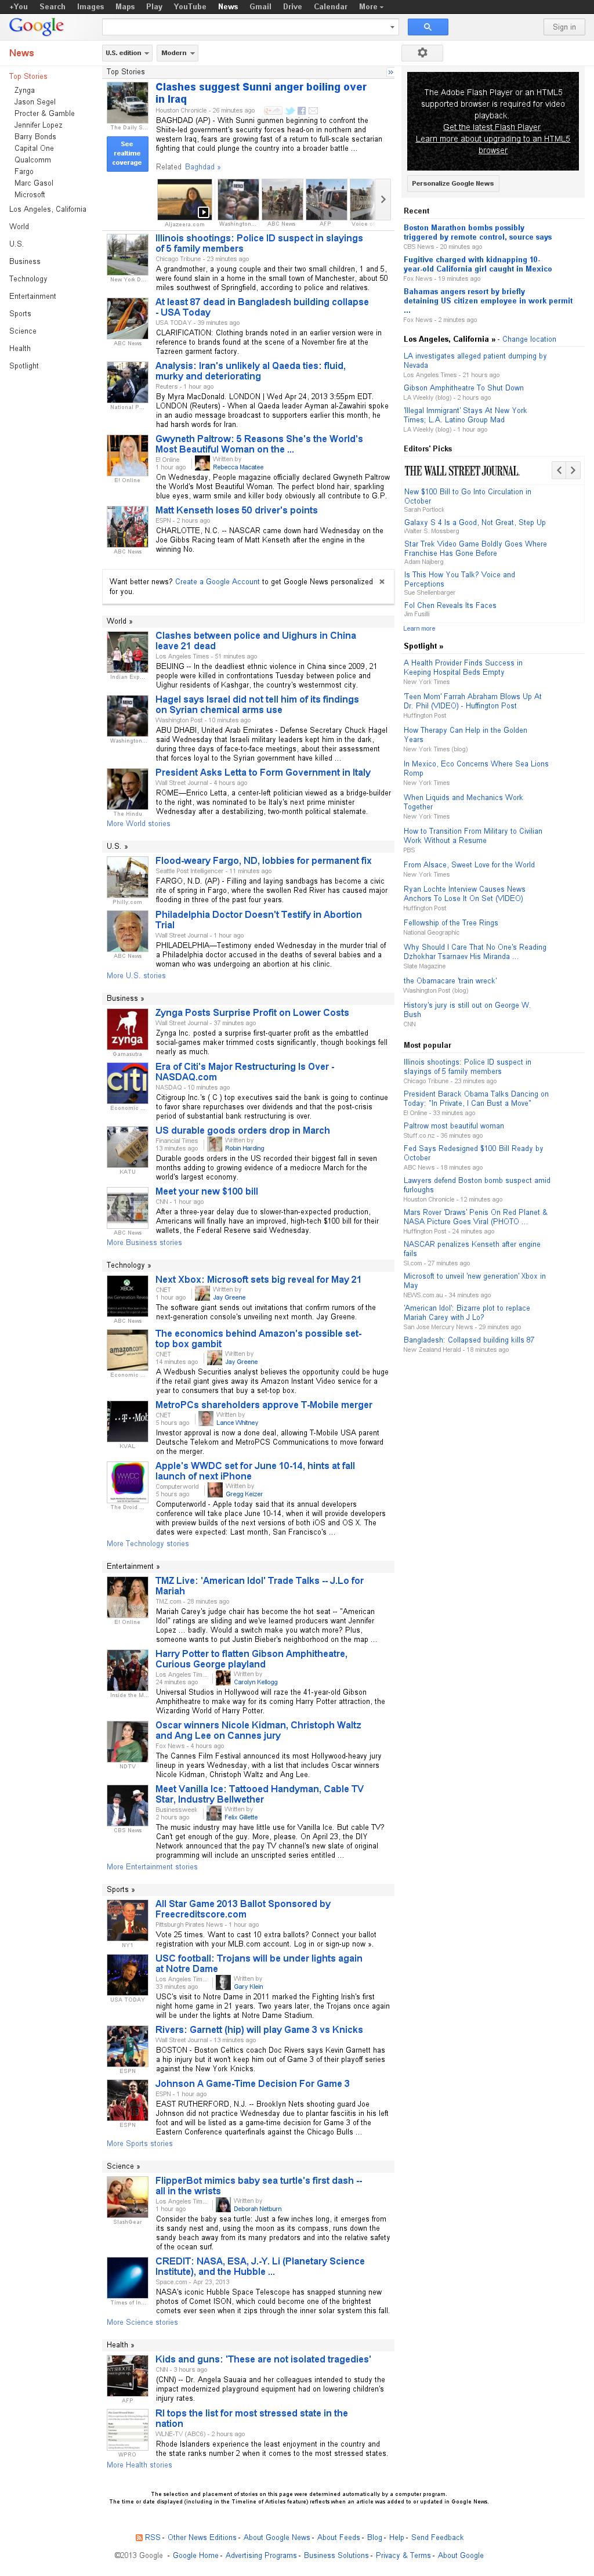 Google News at Wednesday April 24, 2013, 9:07 p.m. UTC